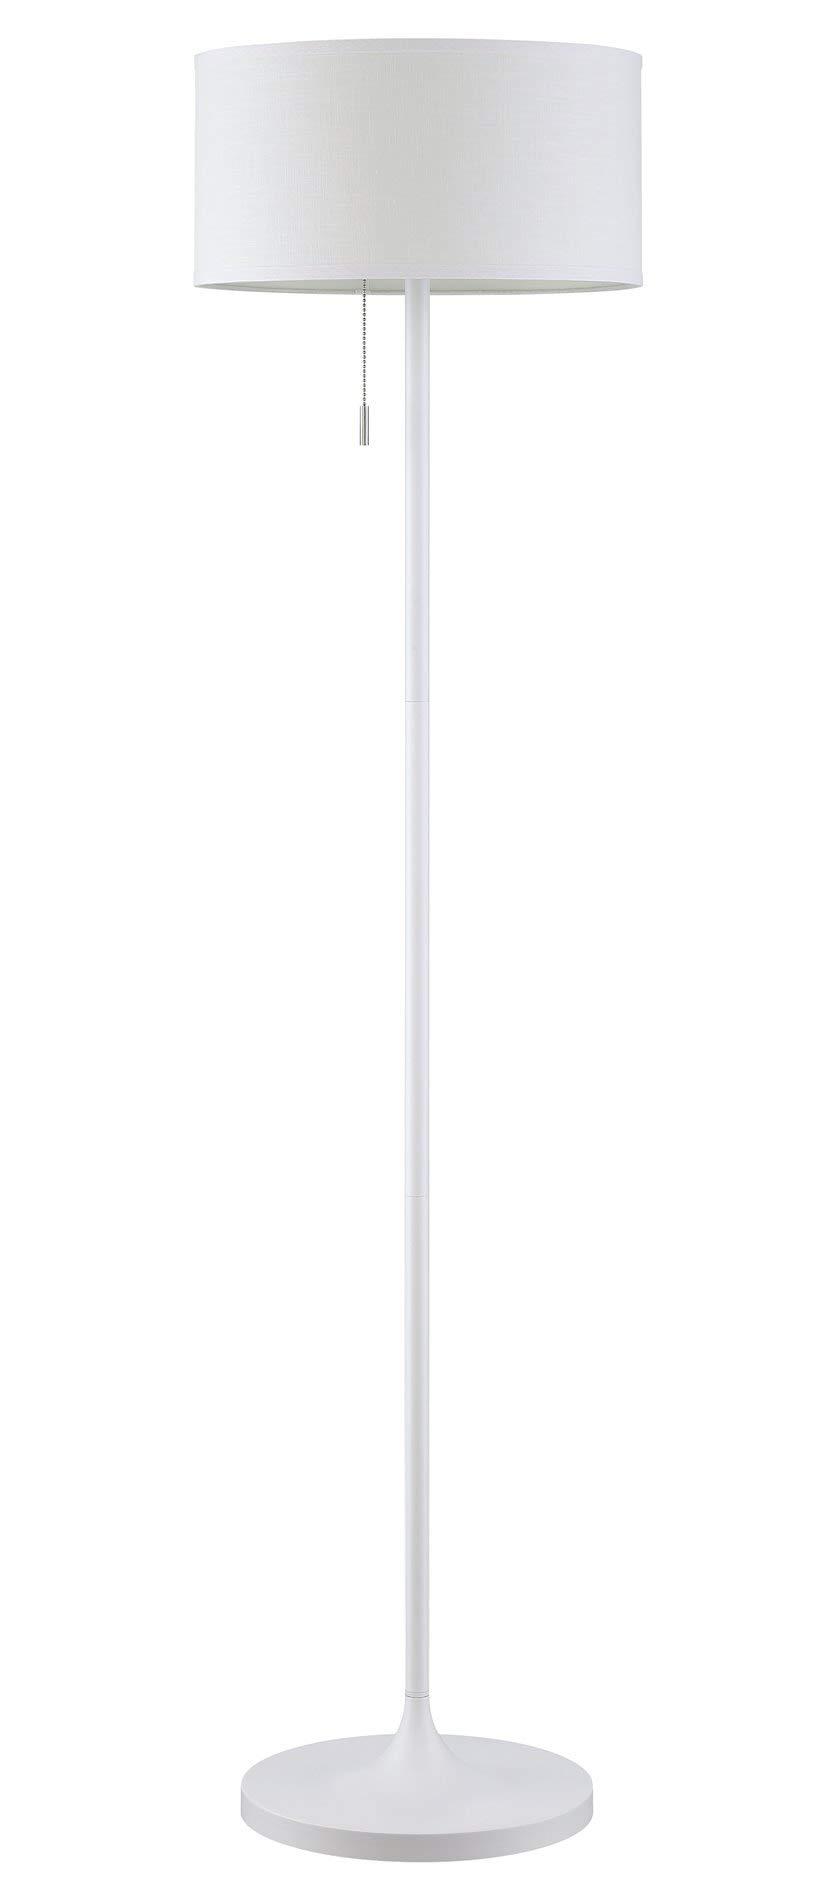 Revel Iris 63'' 2-Light Modern LED Floor Lamp (12W LED (6W x 2), Energy Efficient/Eco-Friendly) + White Shade, White Finish